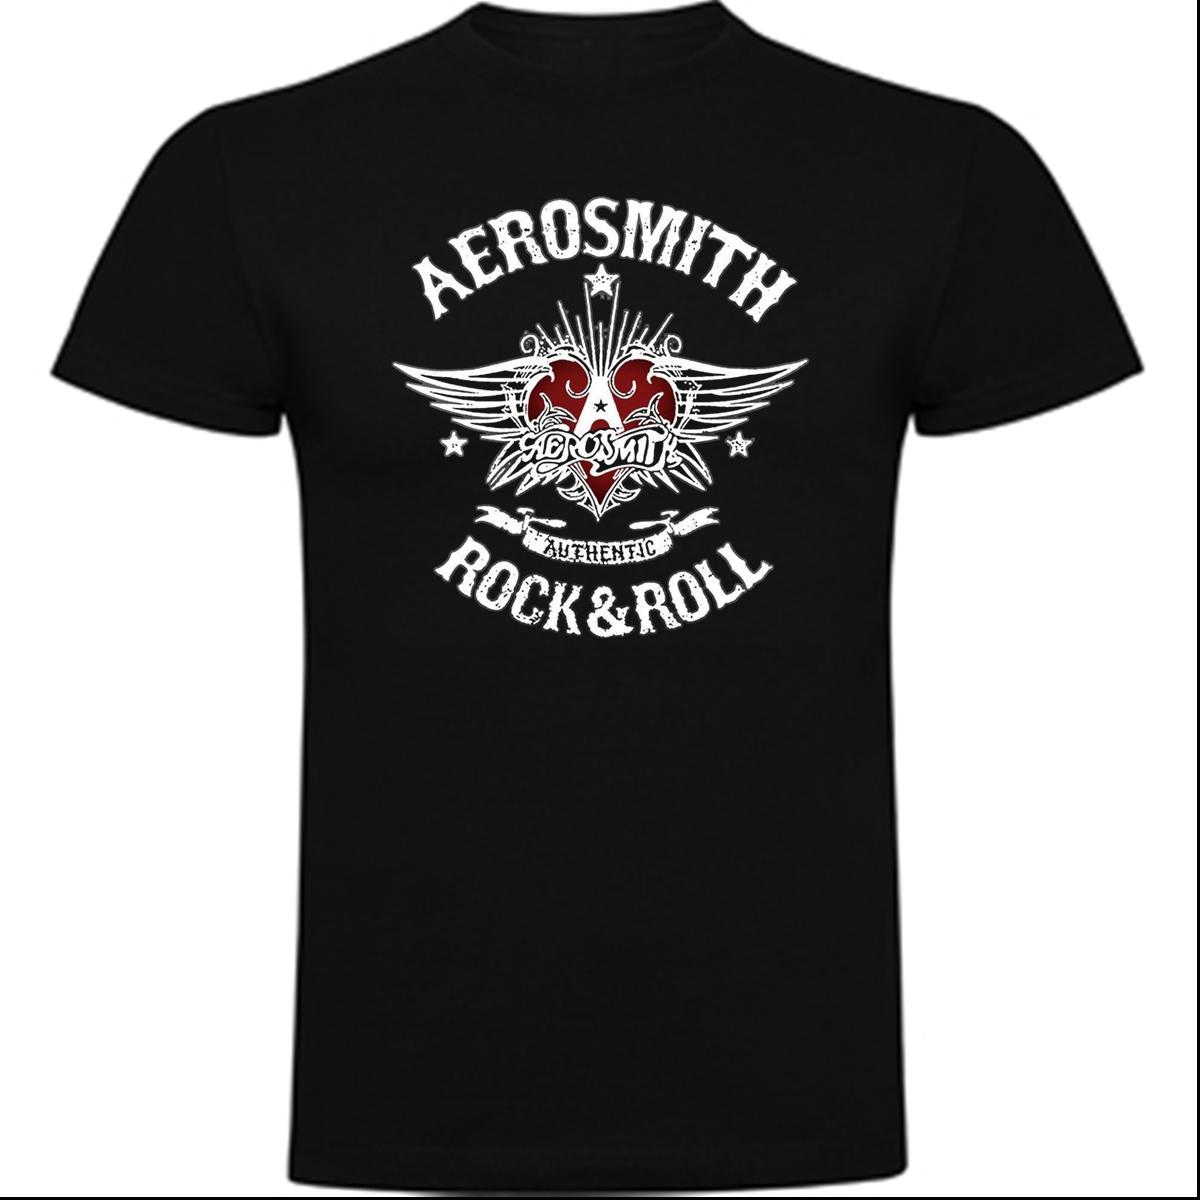 AEROSMITH S XXL T SHIRT HARD ROCK ROLL BAND MUSIC BLUES Short Sleeves New Fashion T